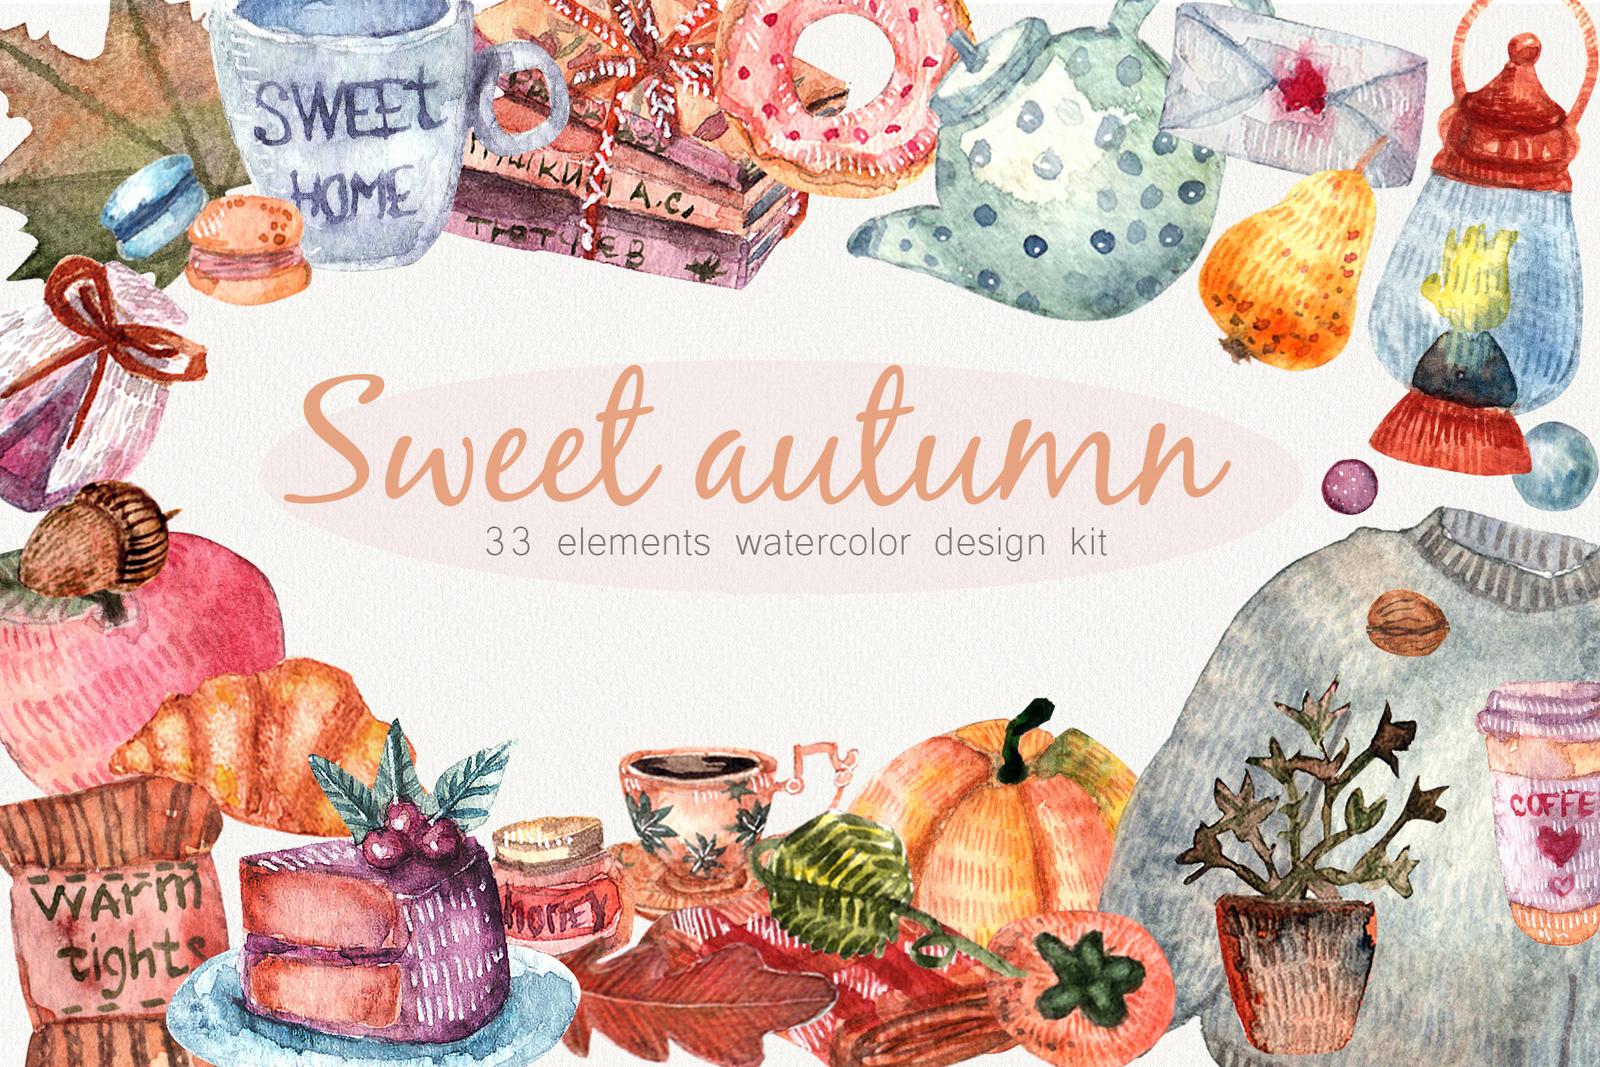 Cozy autumne. Cozy home. Watercolor illustrations